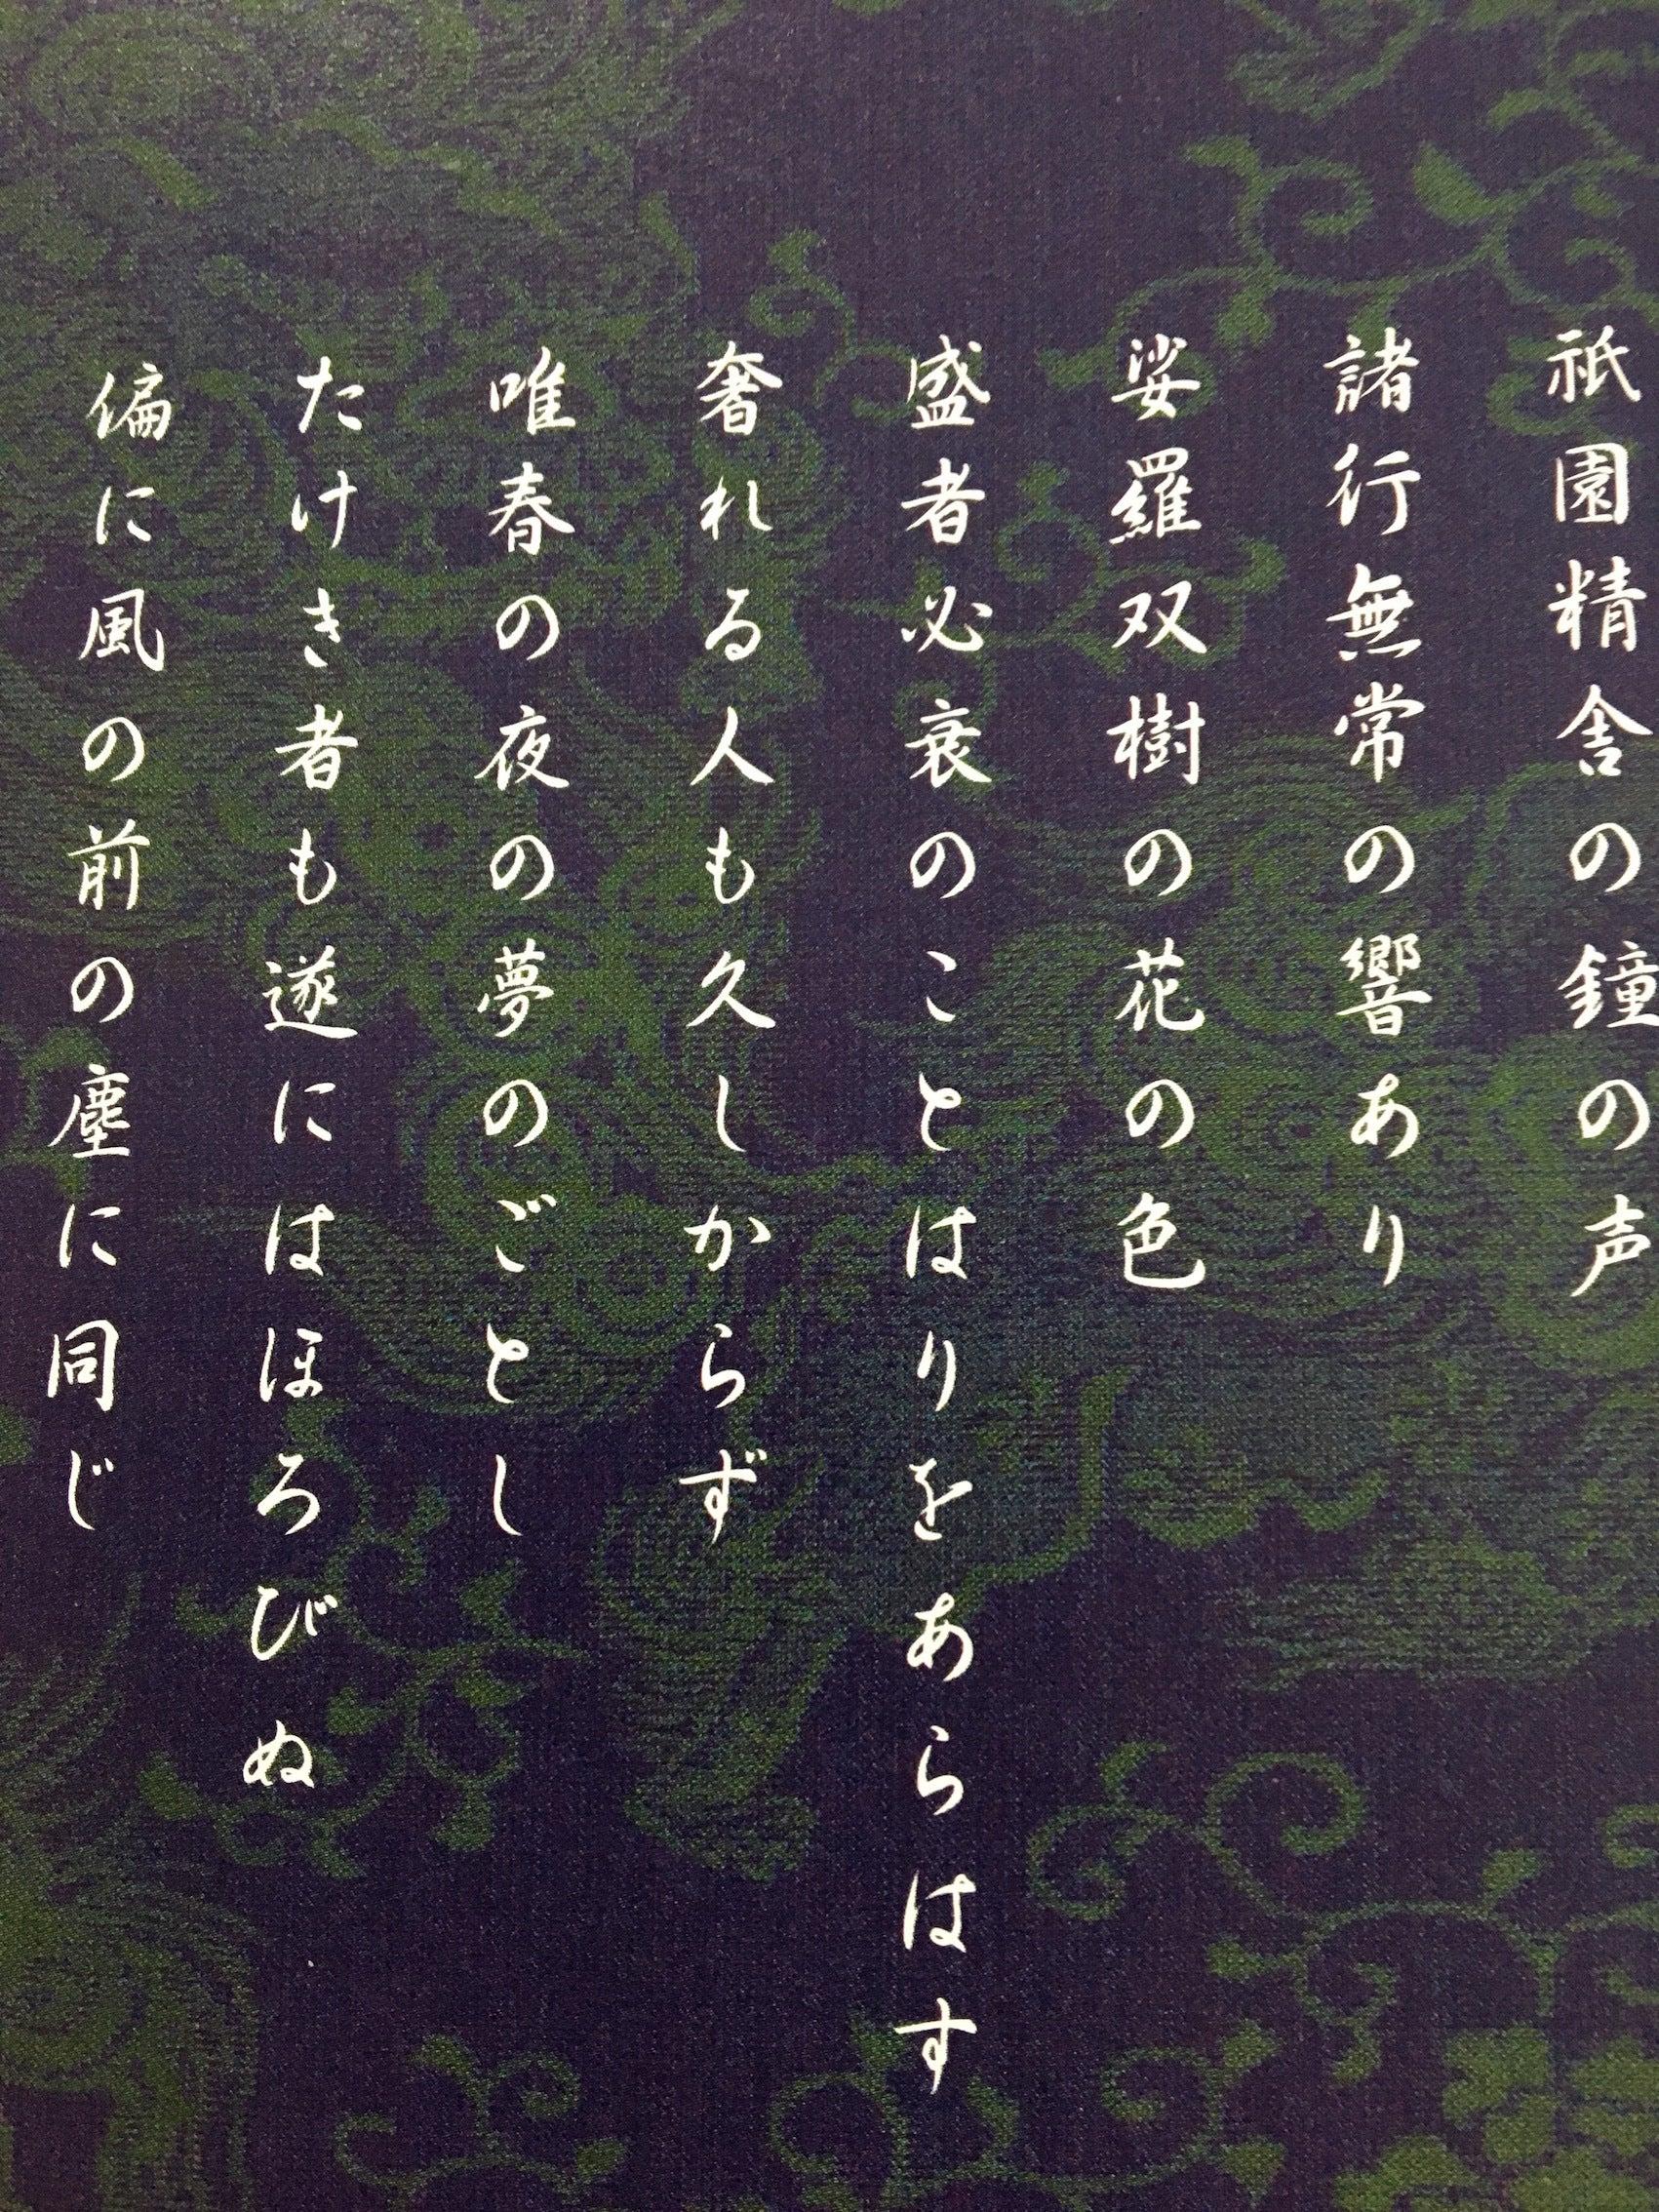 祇園 精舎 の 鐘 の 声